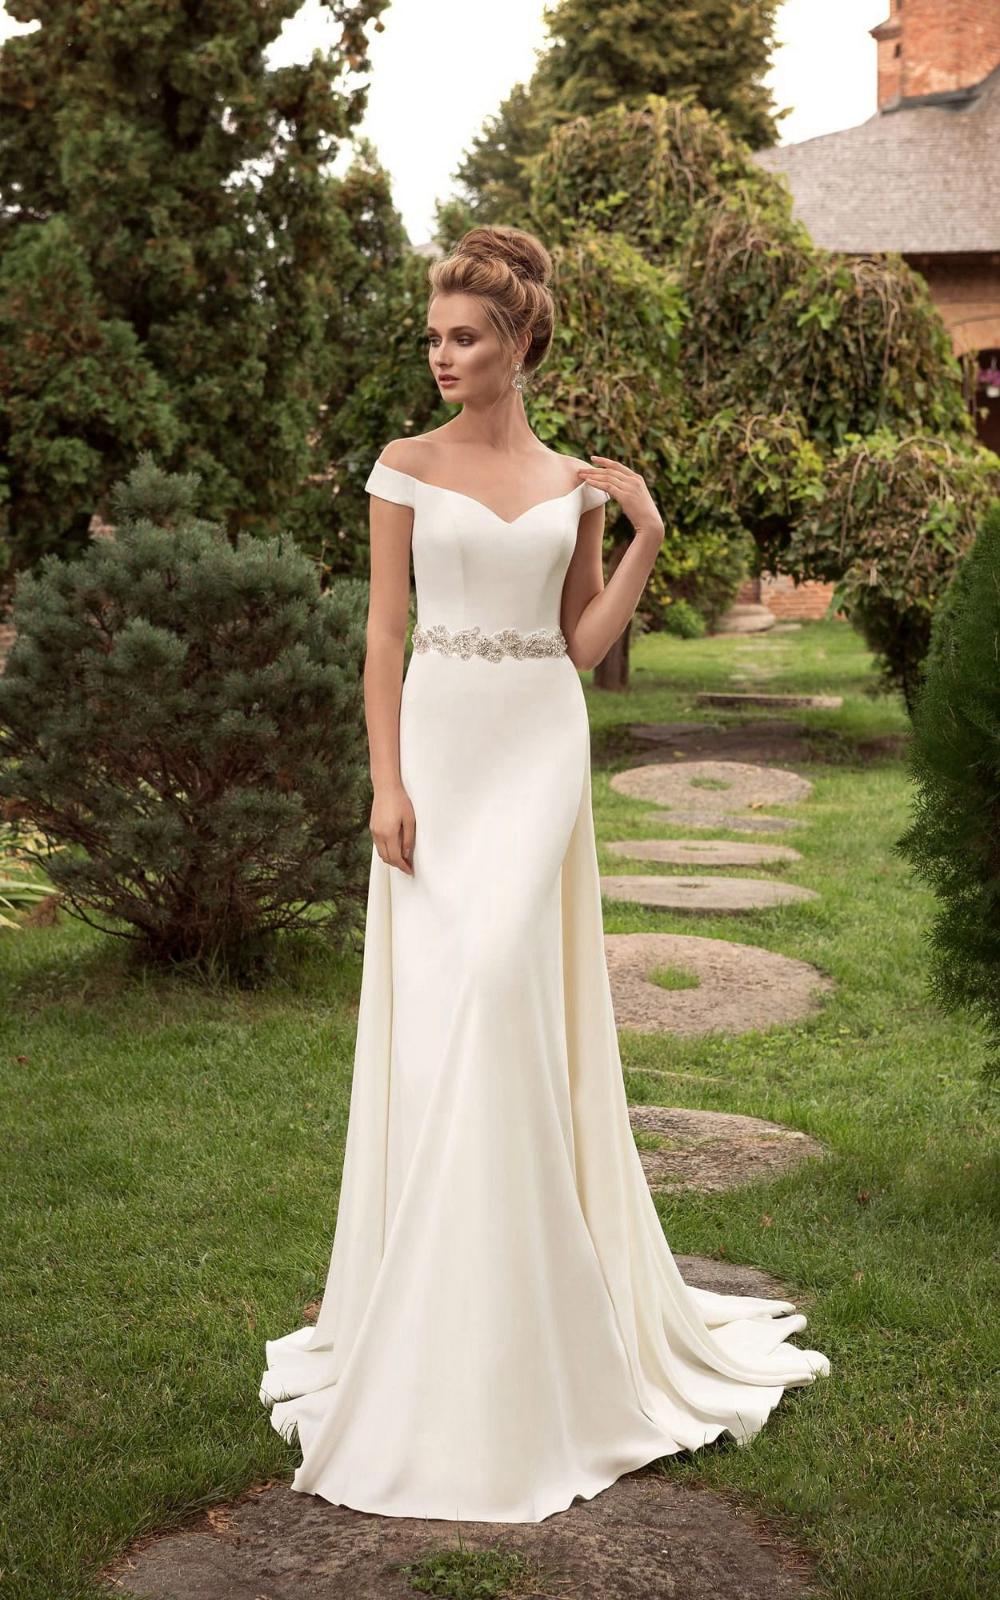 New Wedding Dresses Bridal Resale Near Me Wedding Dresses